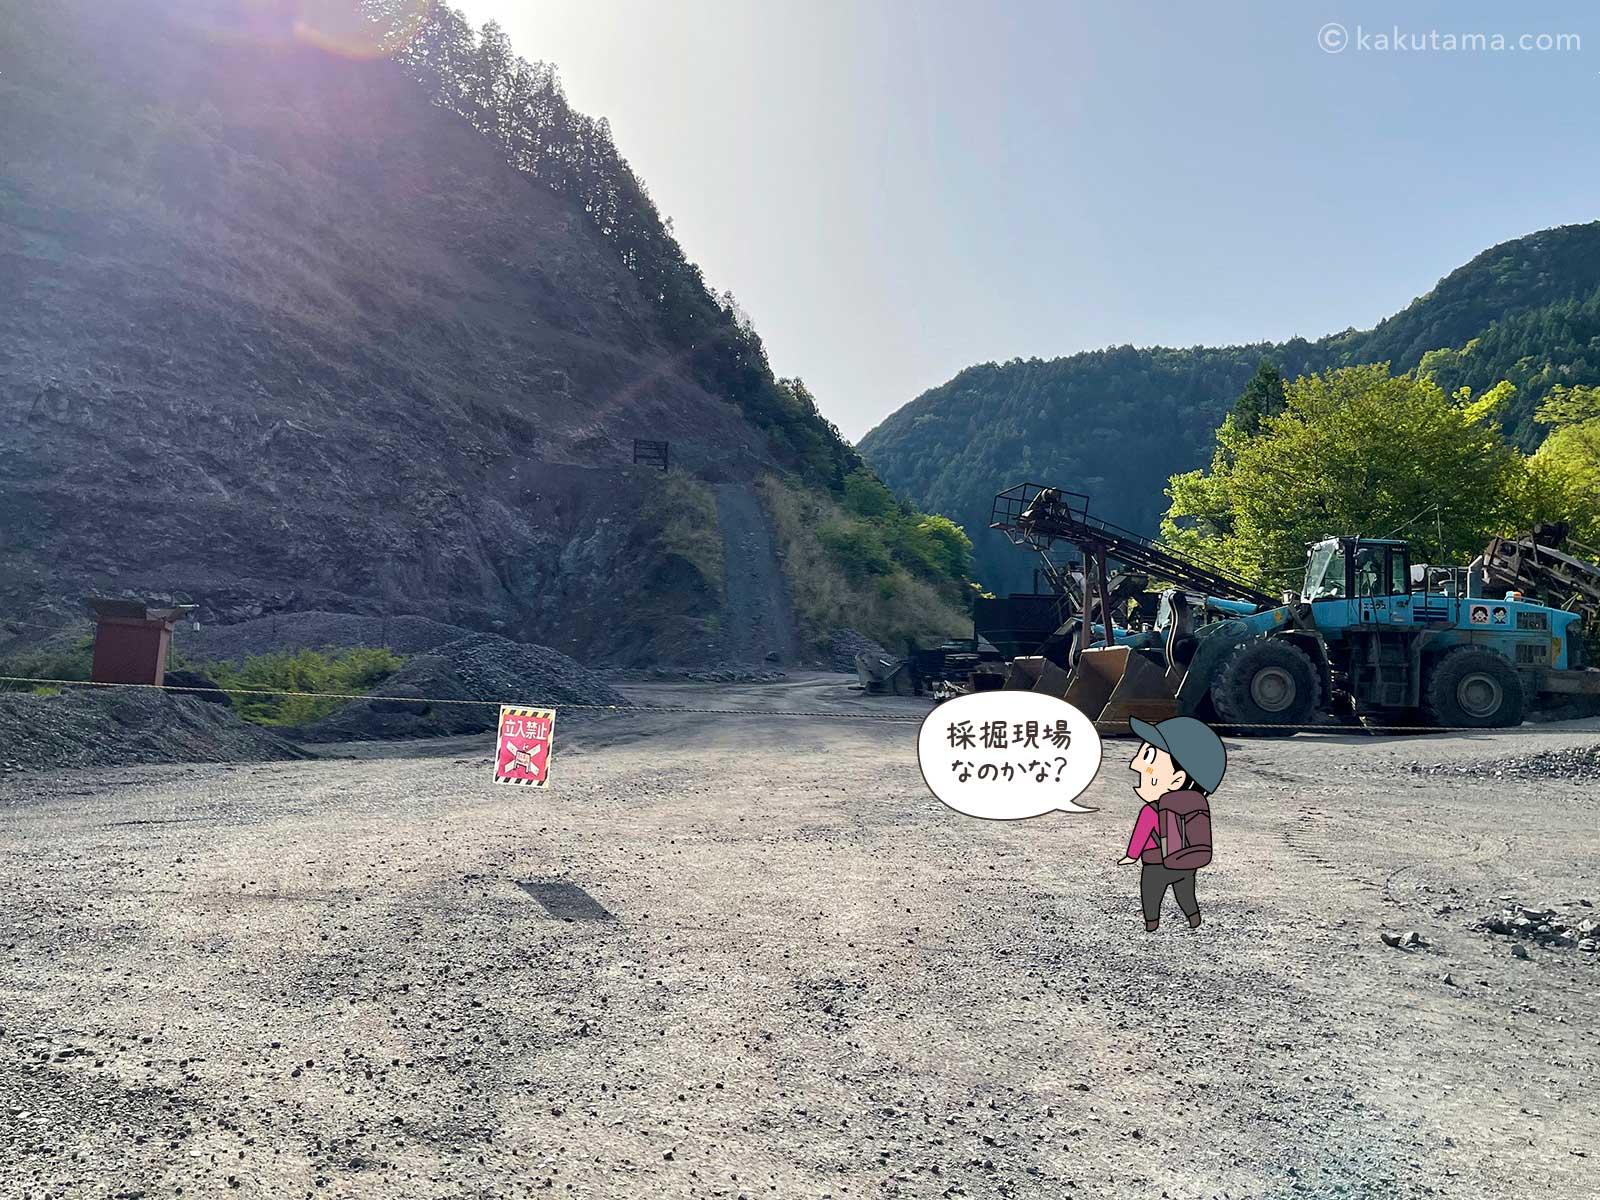 大岳山鍾乳洞手前の掘削路